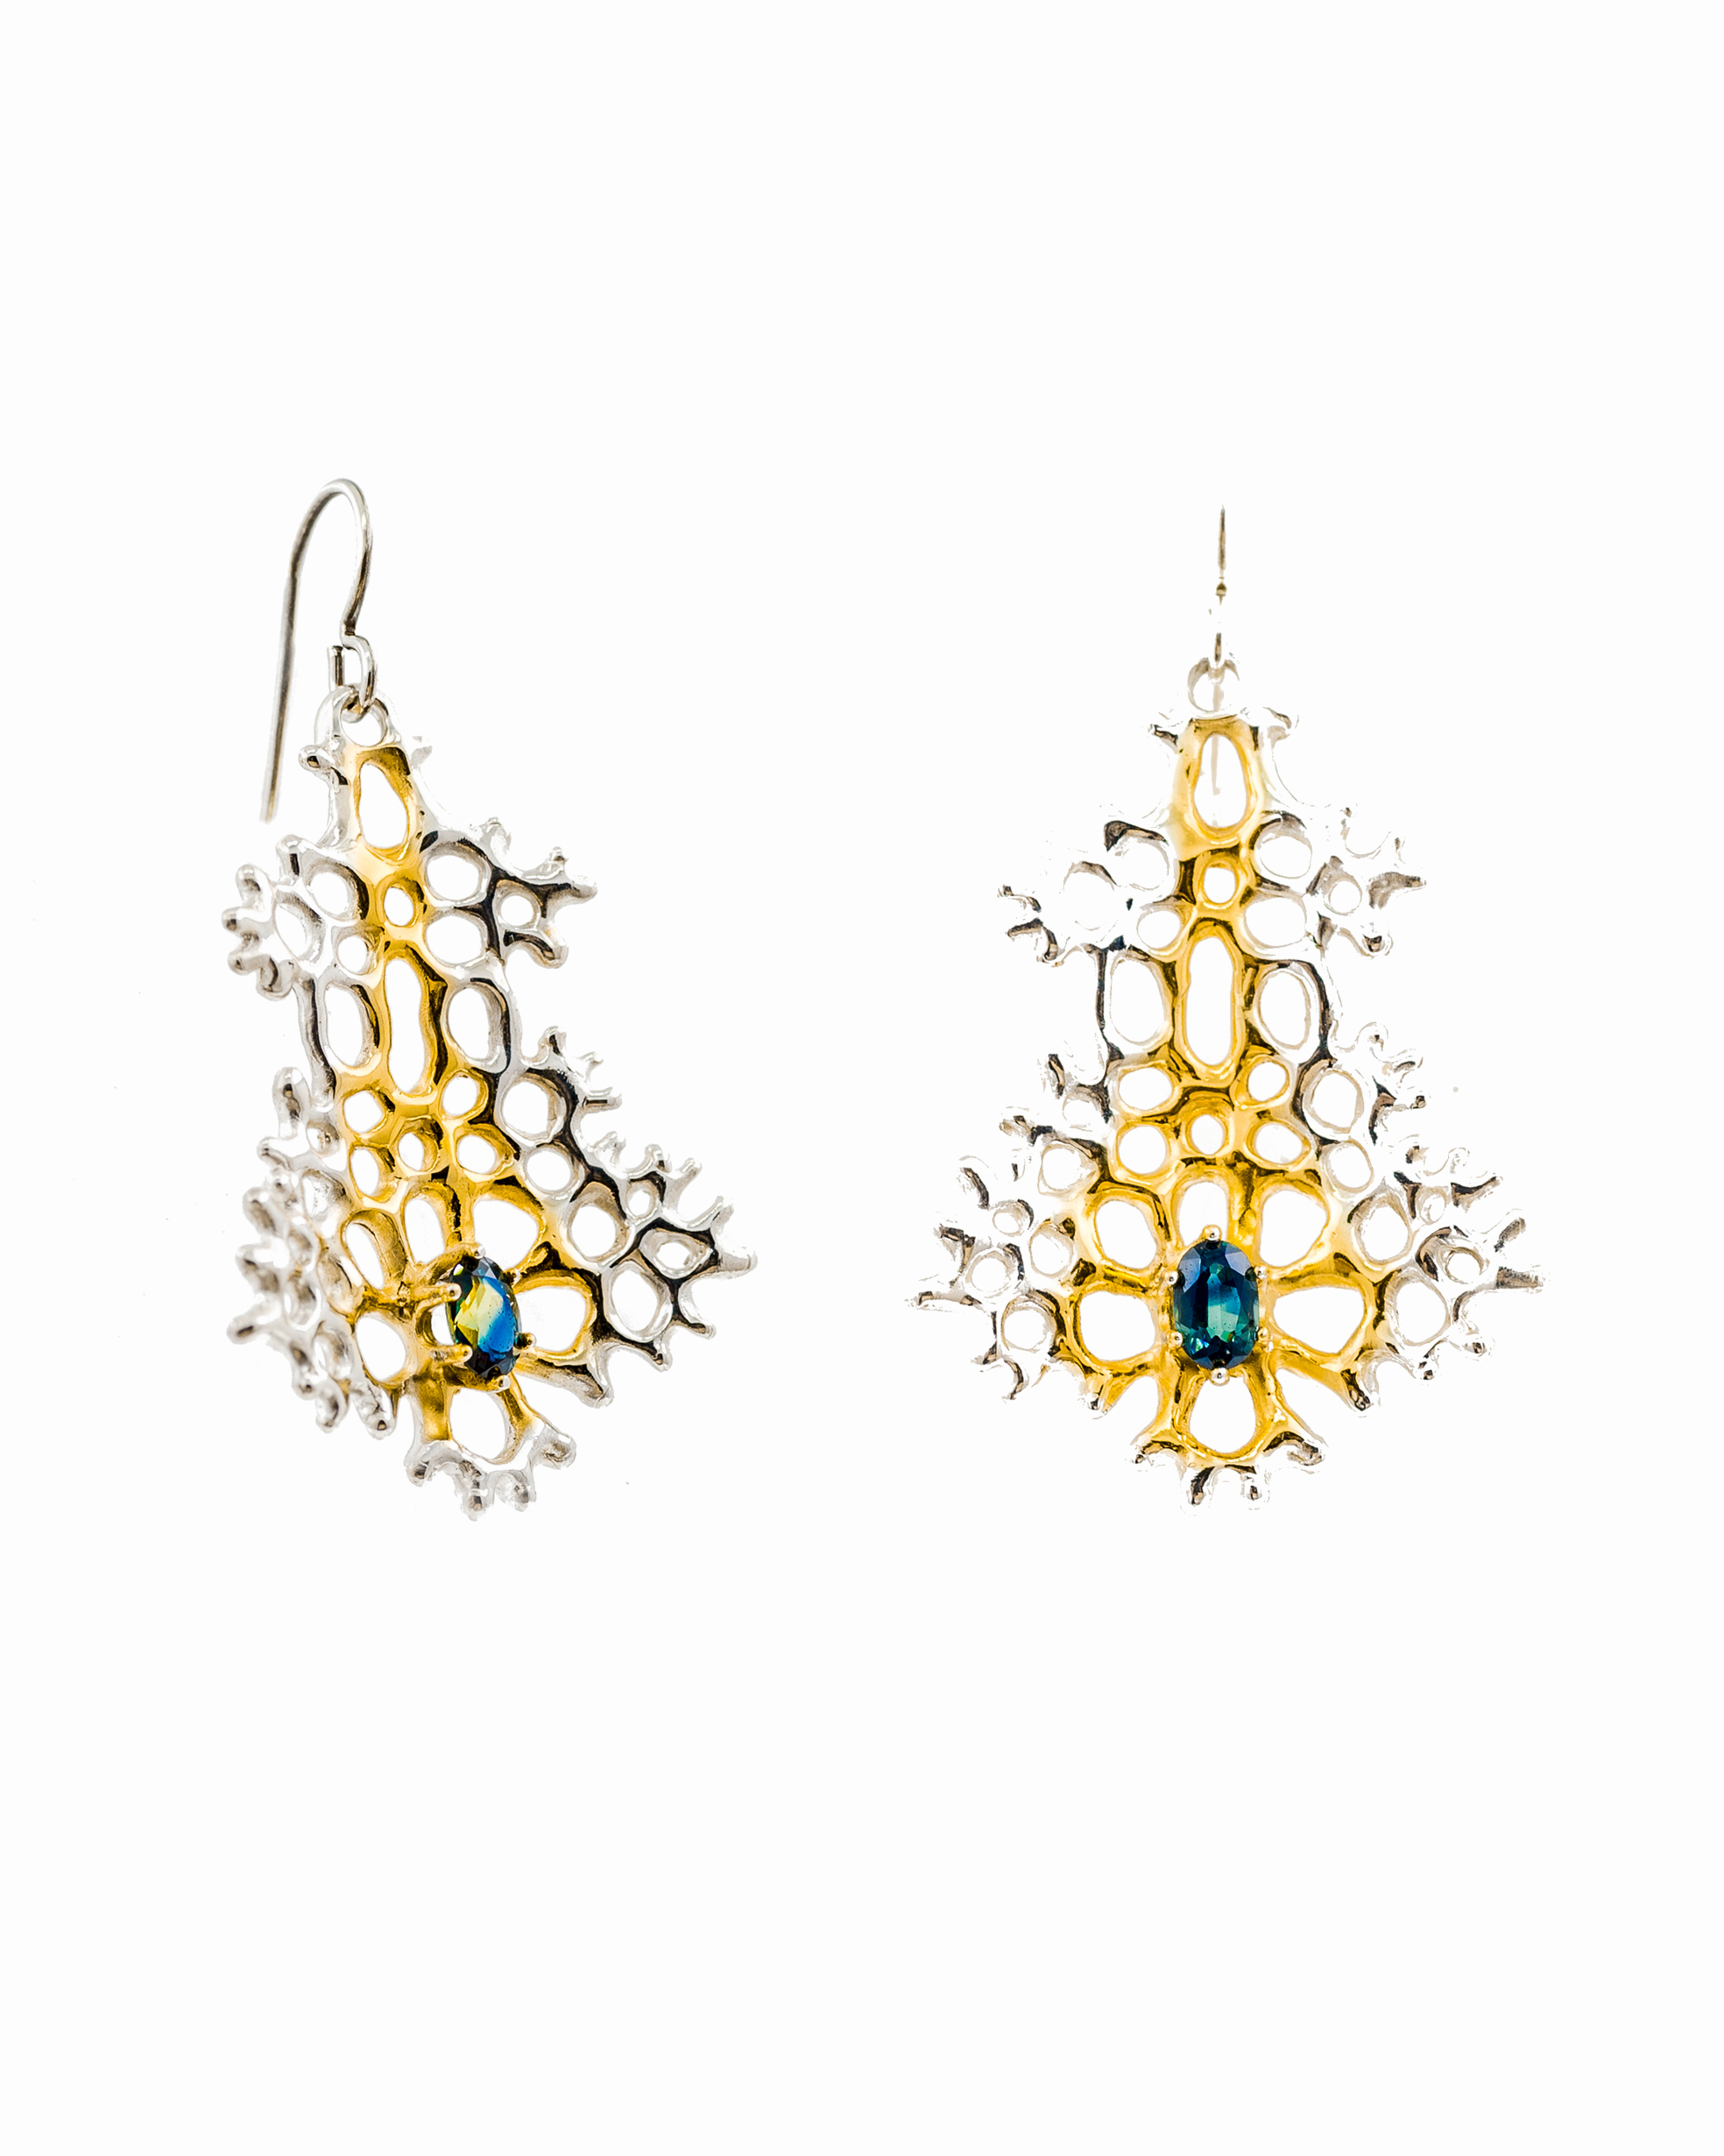 Radial Earrings | Sterling silver, Australian sapphires.